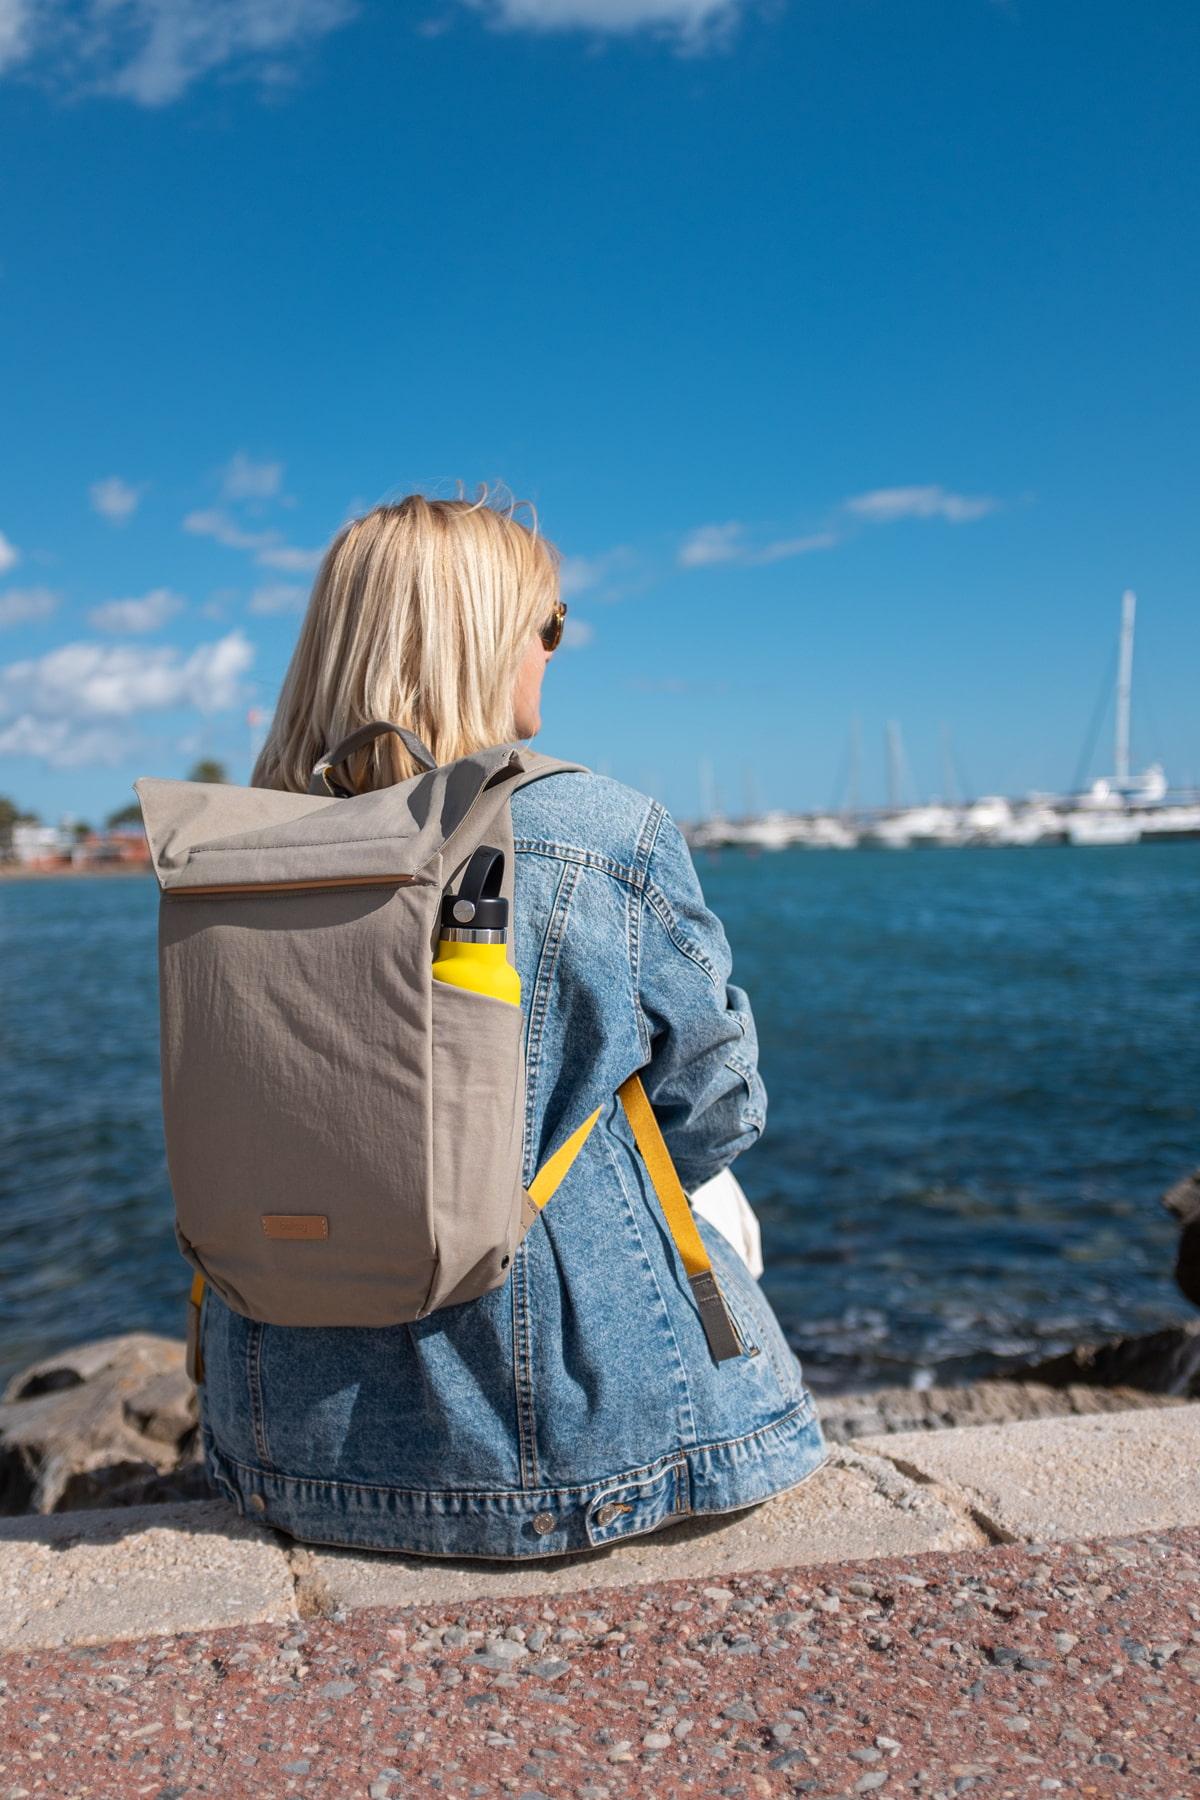 Best Backpack for Women in 2021